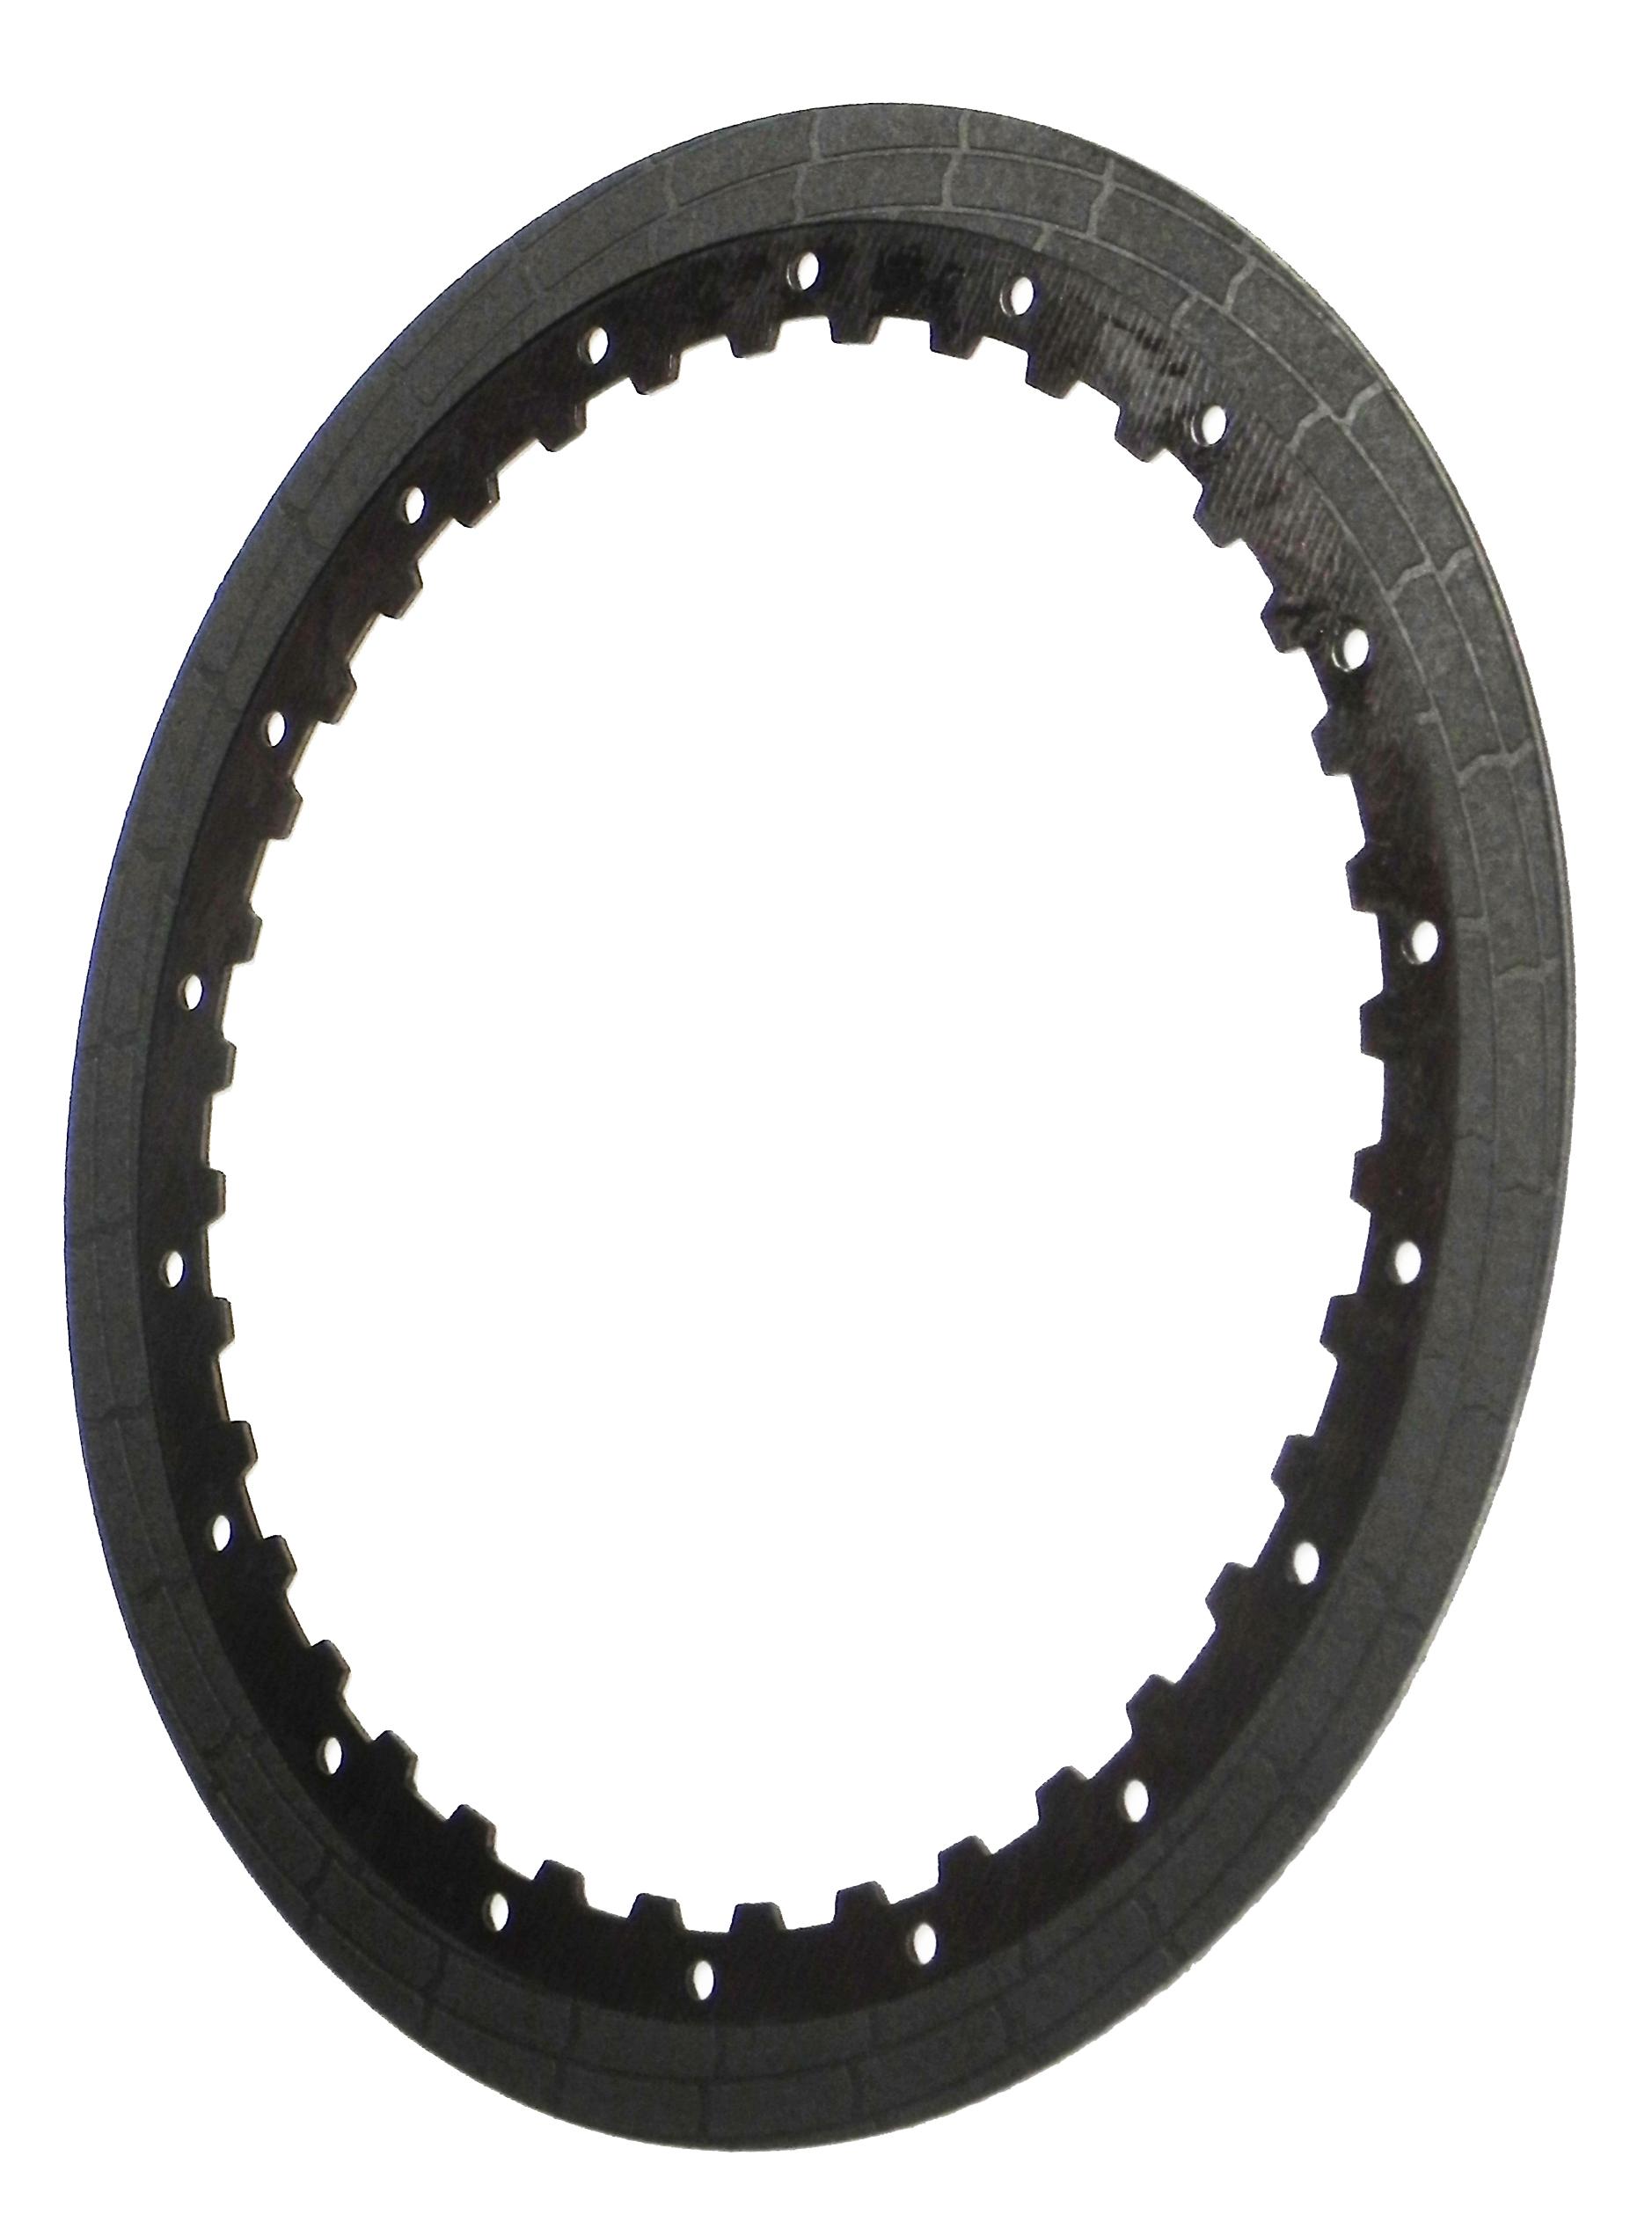 RH560685 | 2009-ON Friction Clutch Plate (HT) Hybrid Technology Underdrive Proprietary High Energy (HT)